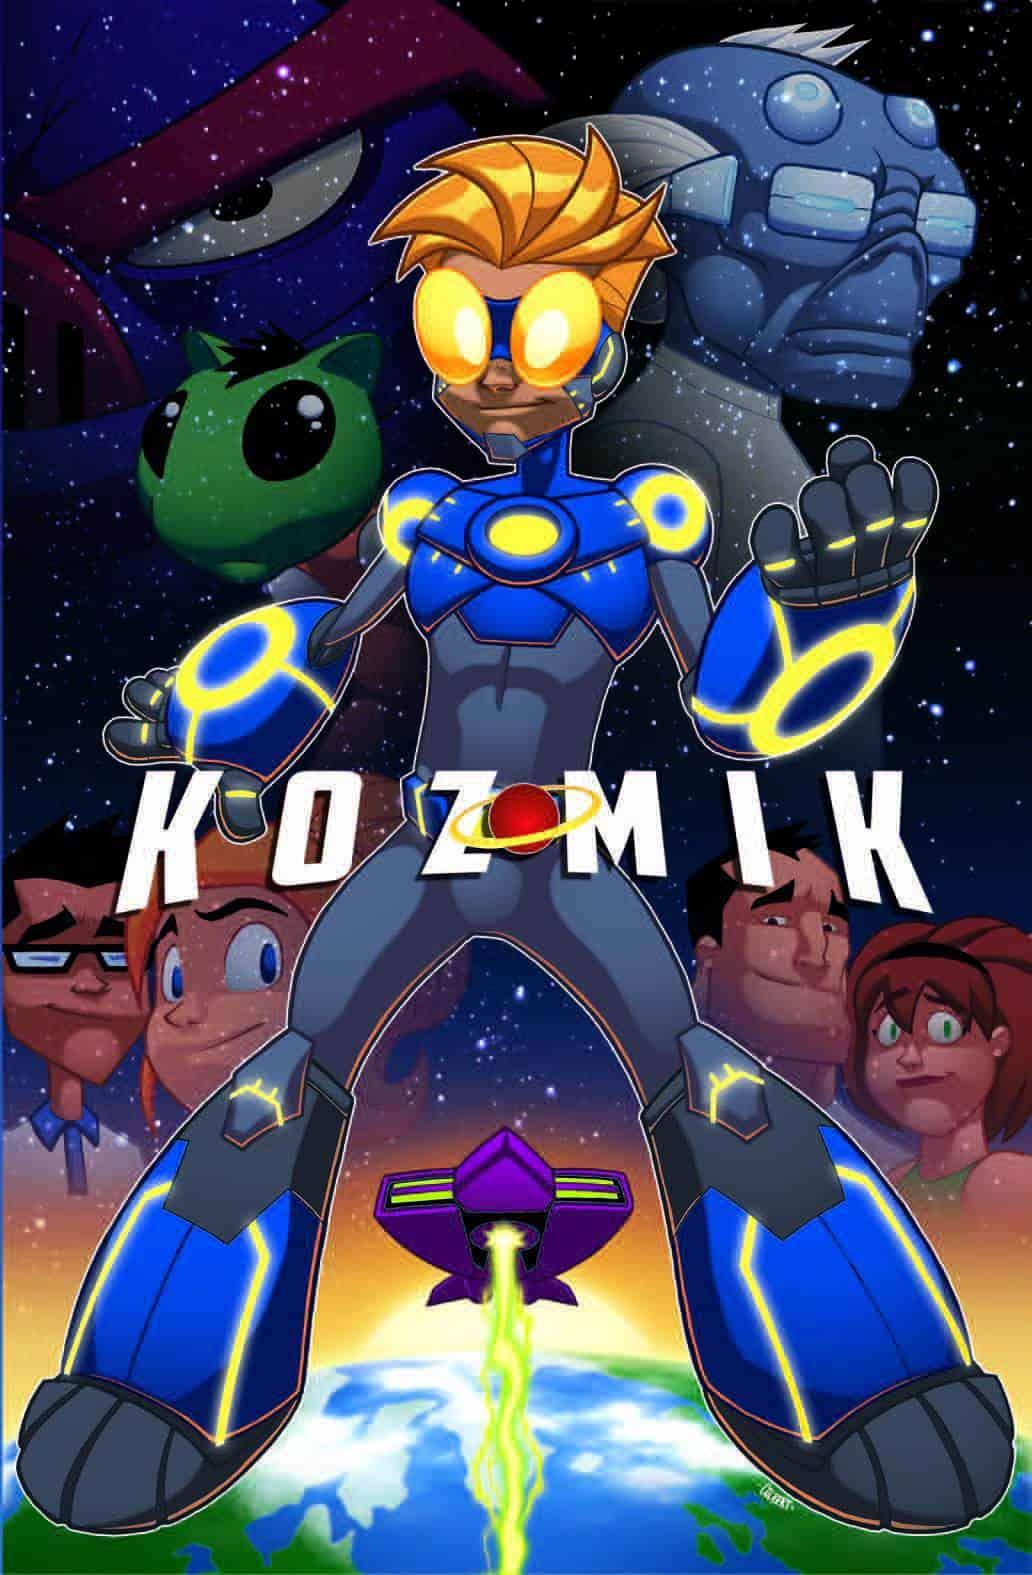 Kozmik